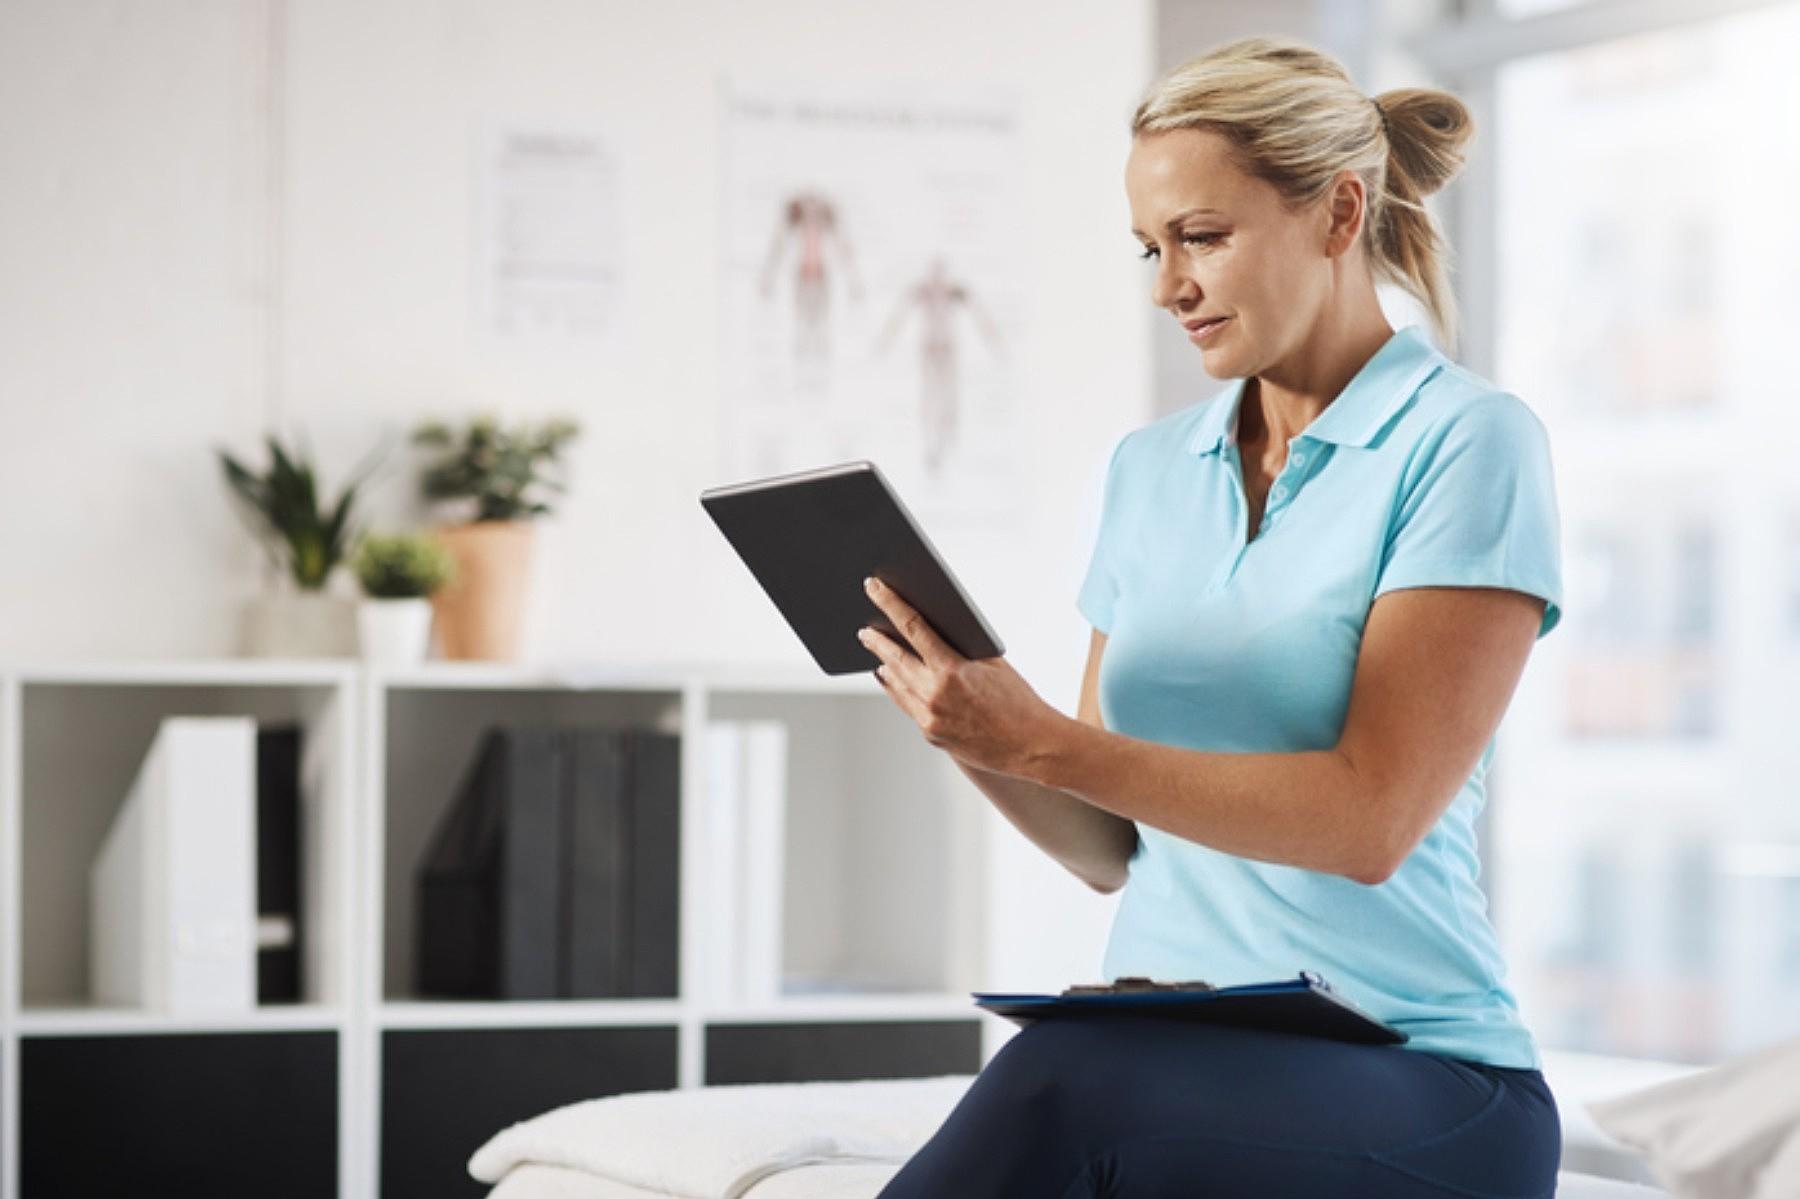 Como funciona o teleatendimento na fisioterapia durante a pandemia?